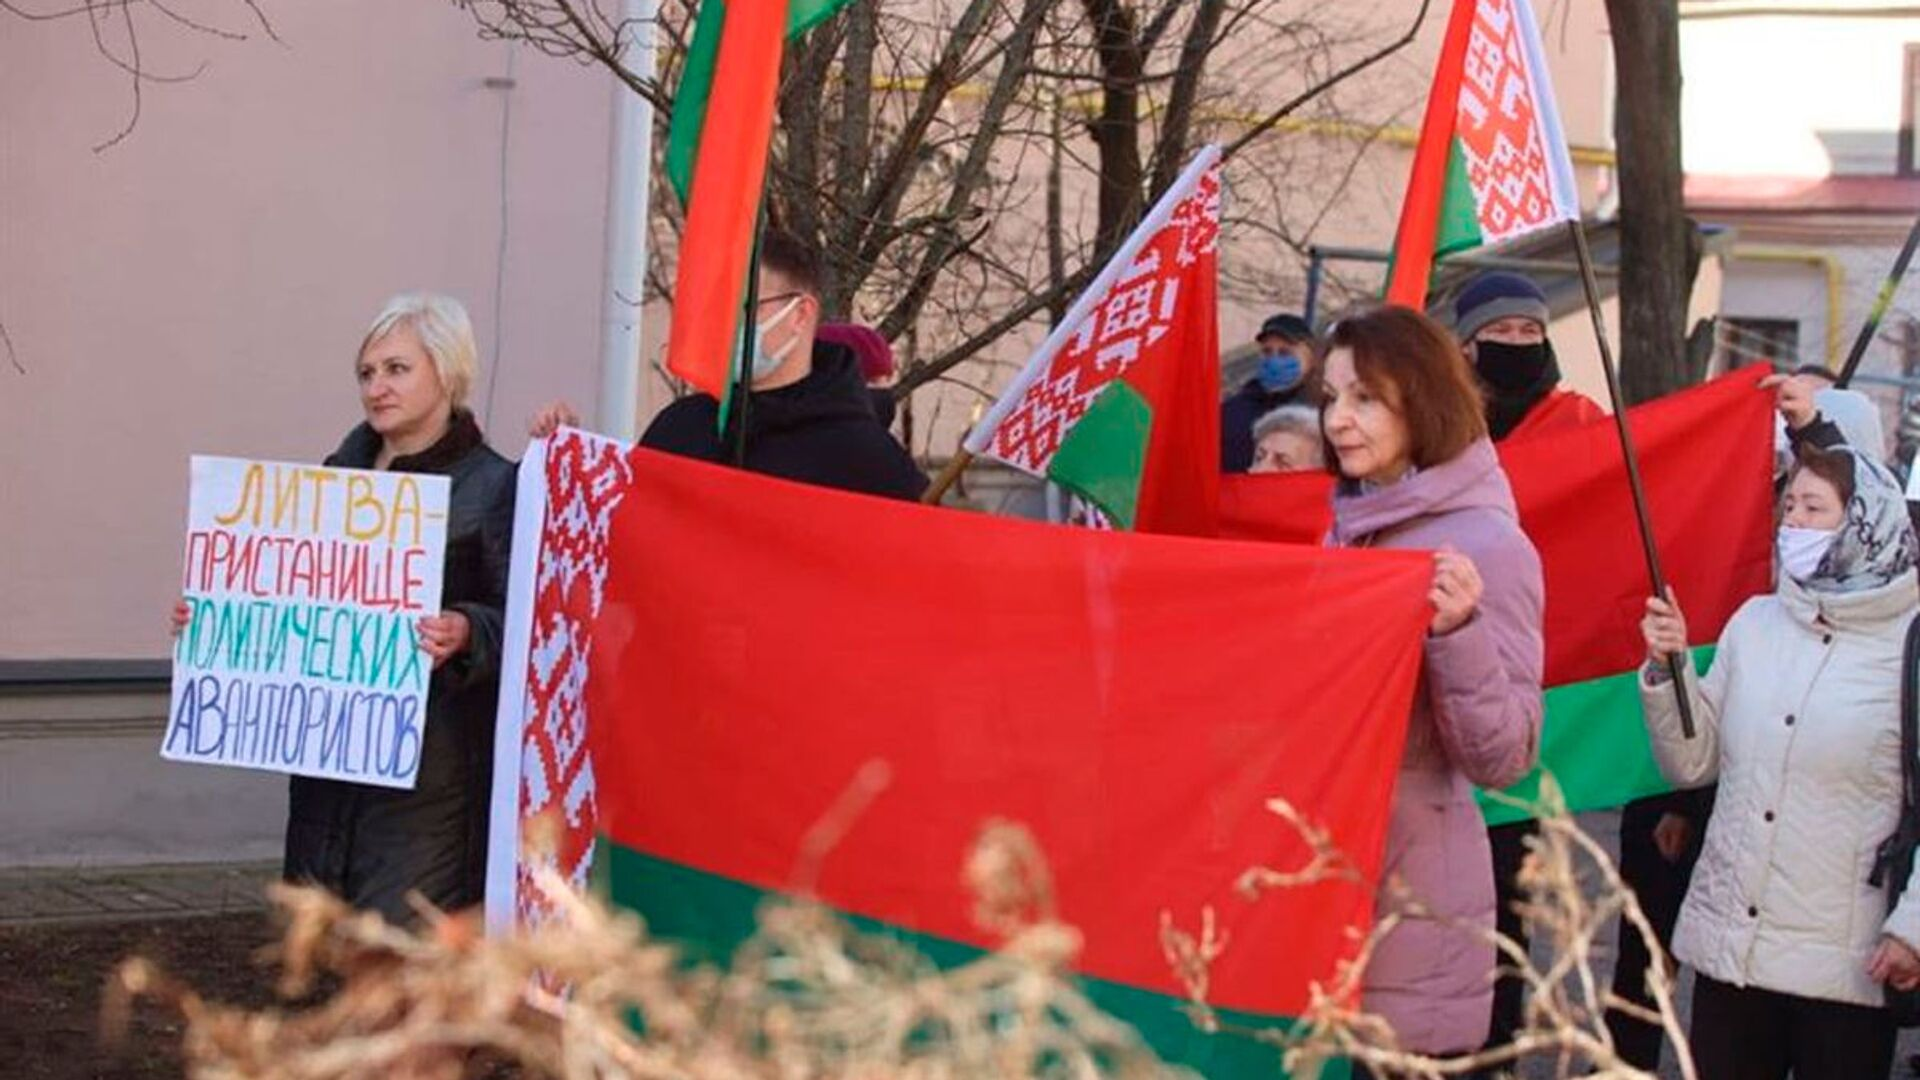 Protesty pod polskimi konsulatami na Białorusi - Sputnik Polska, 1920, 05.07.2021